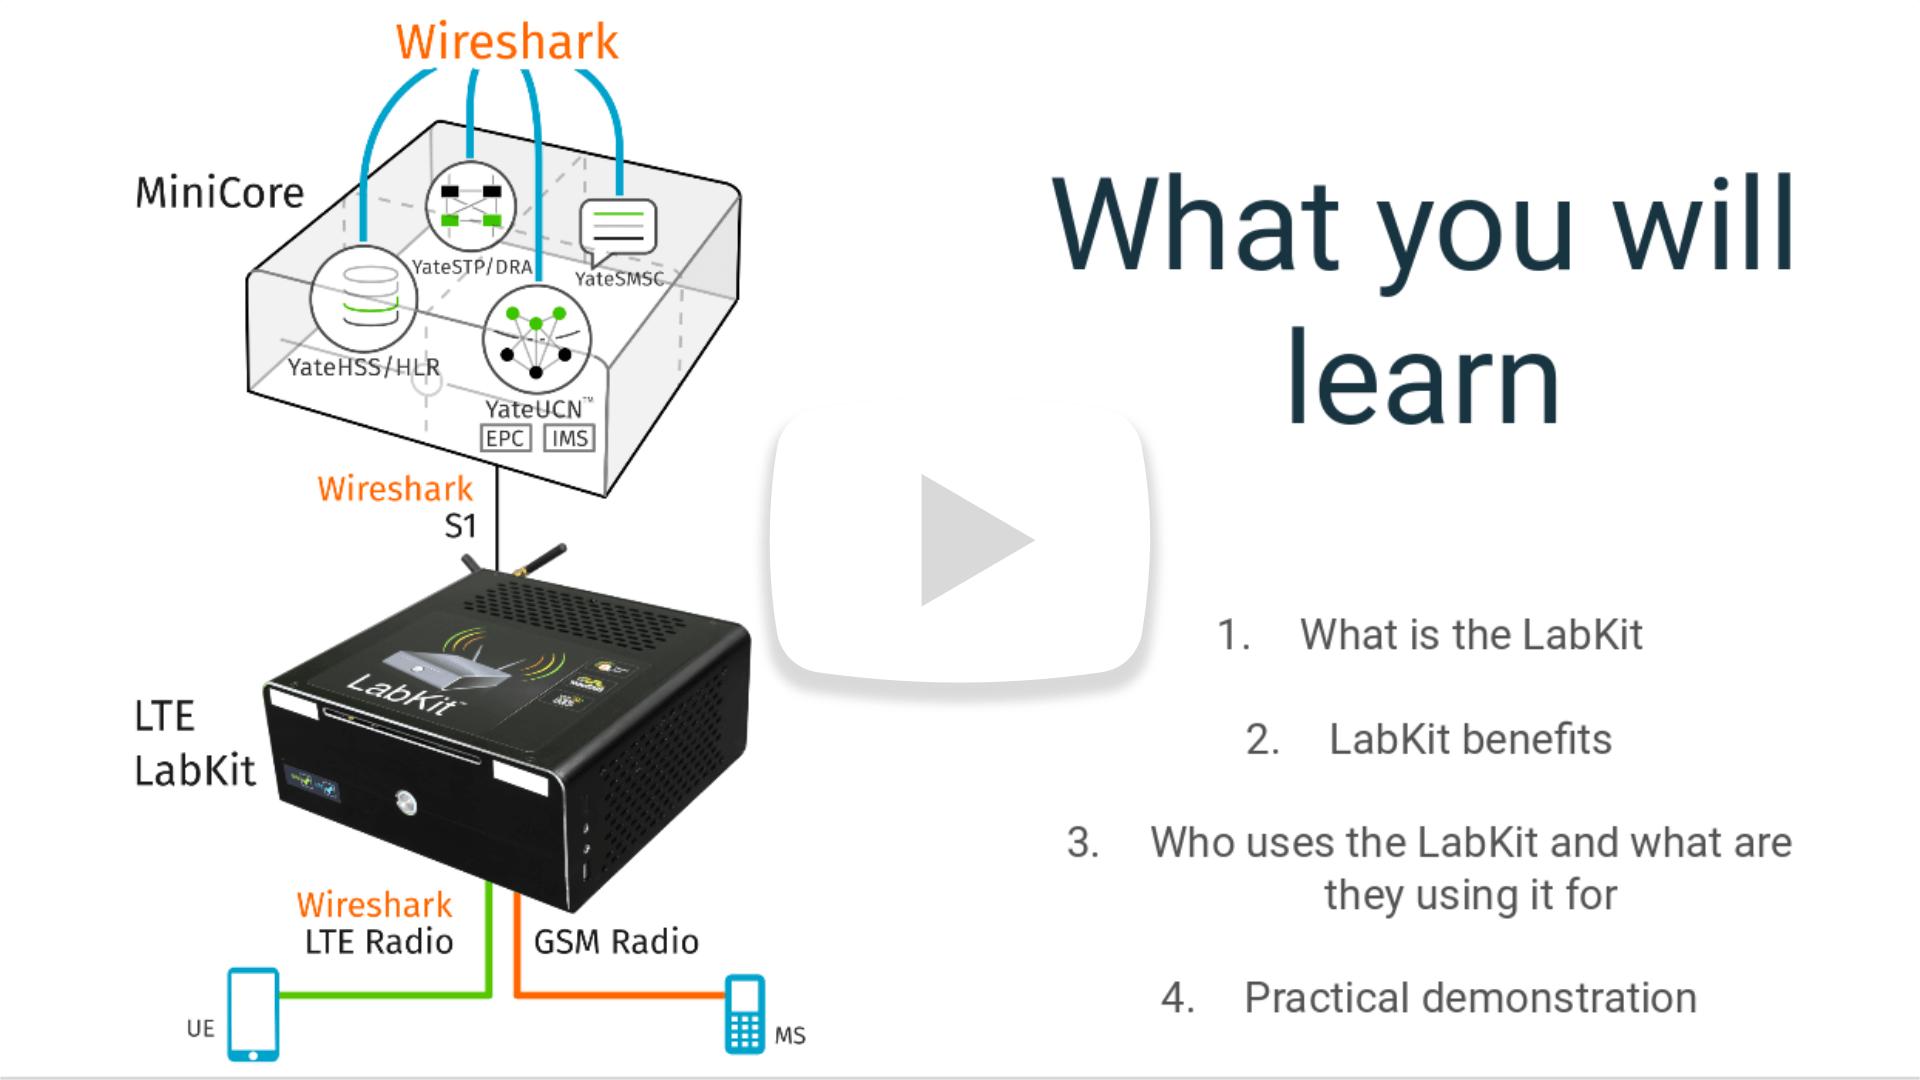 LTE LabKit Webinar - Configuration and practical demonstration 1